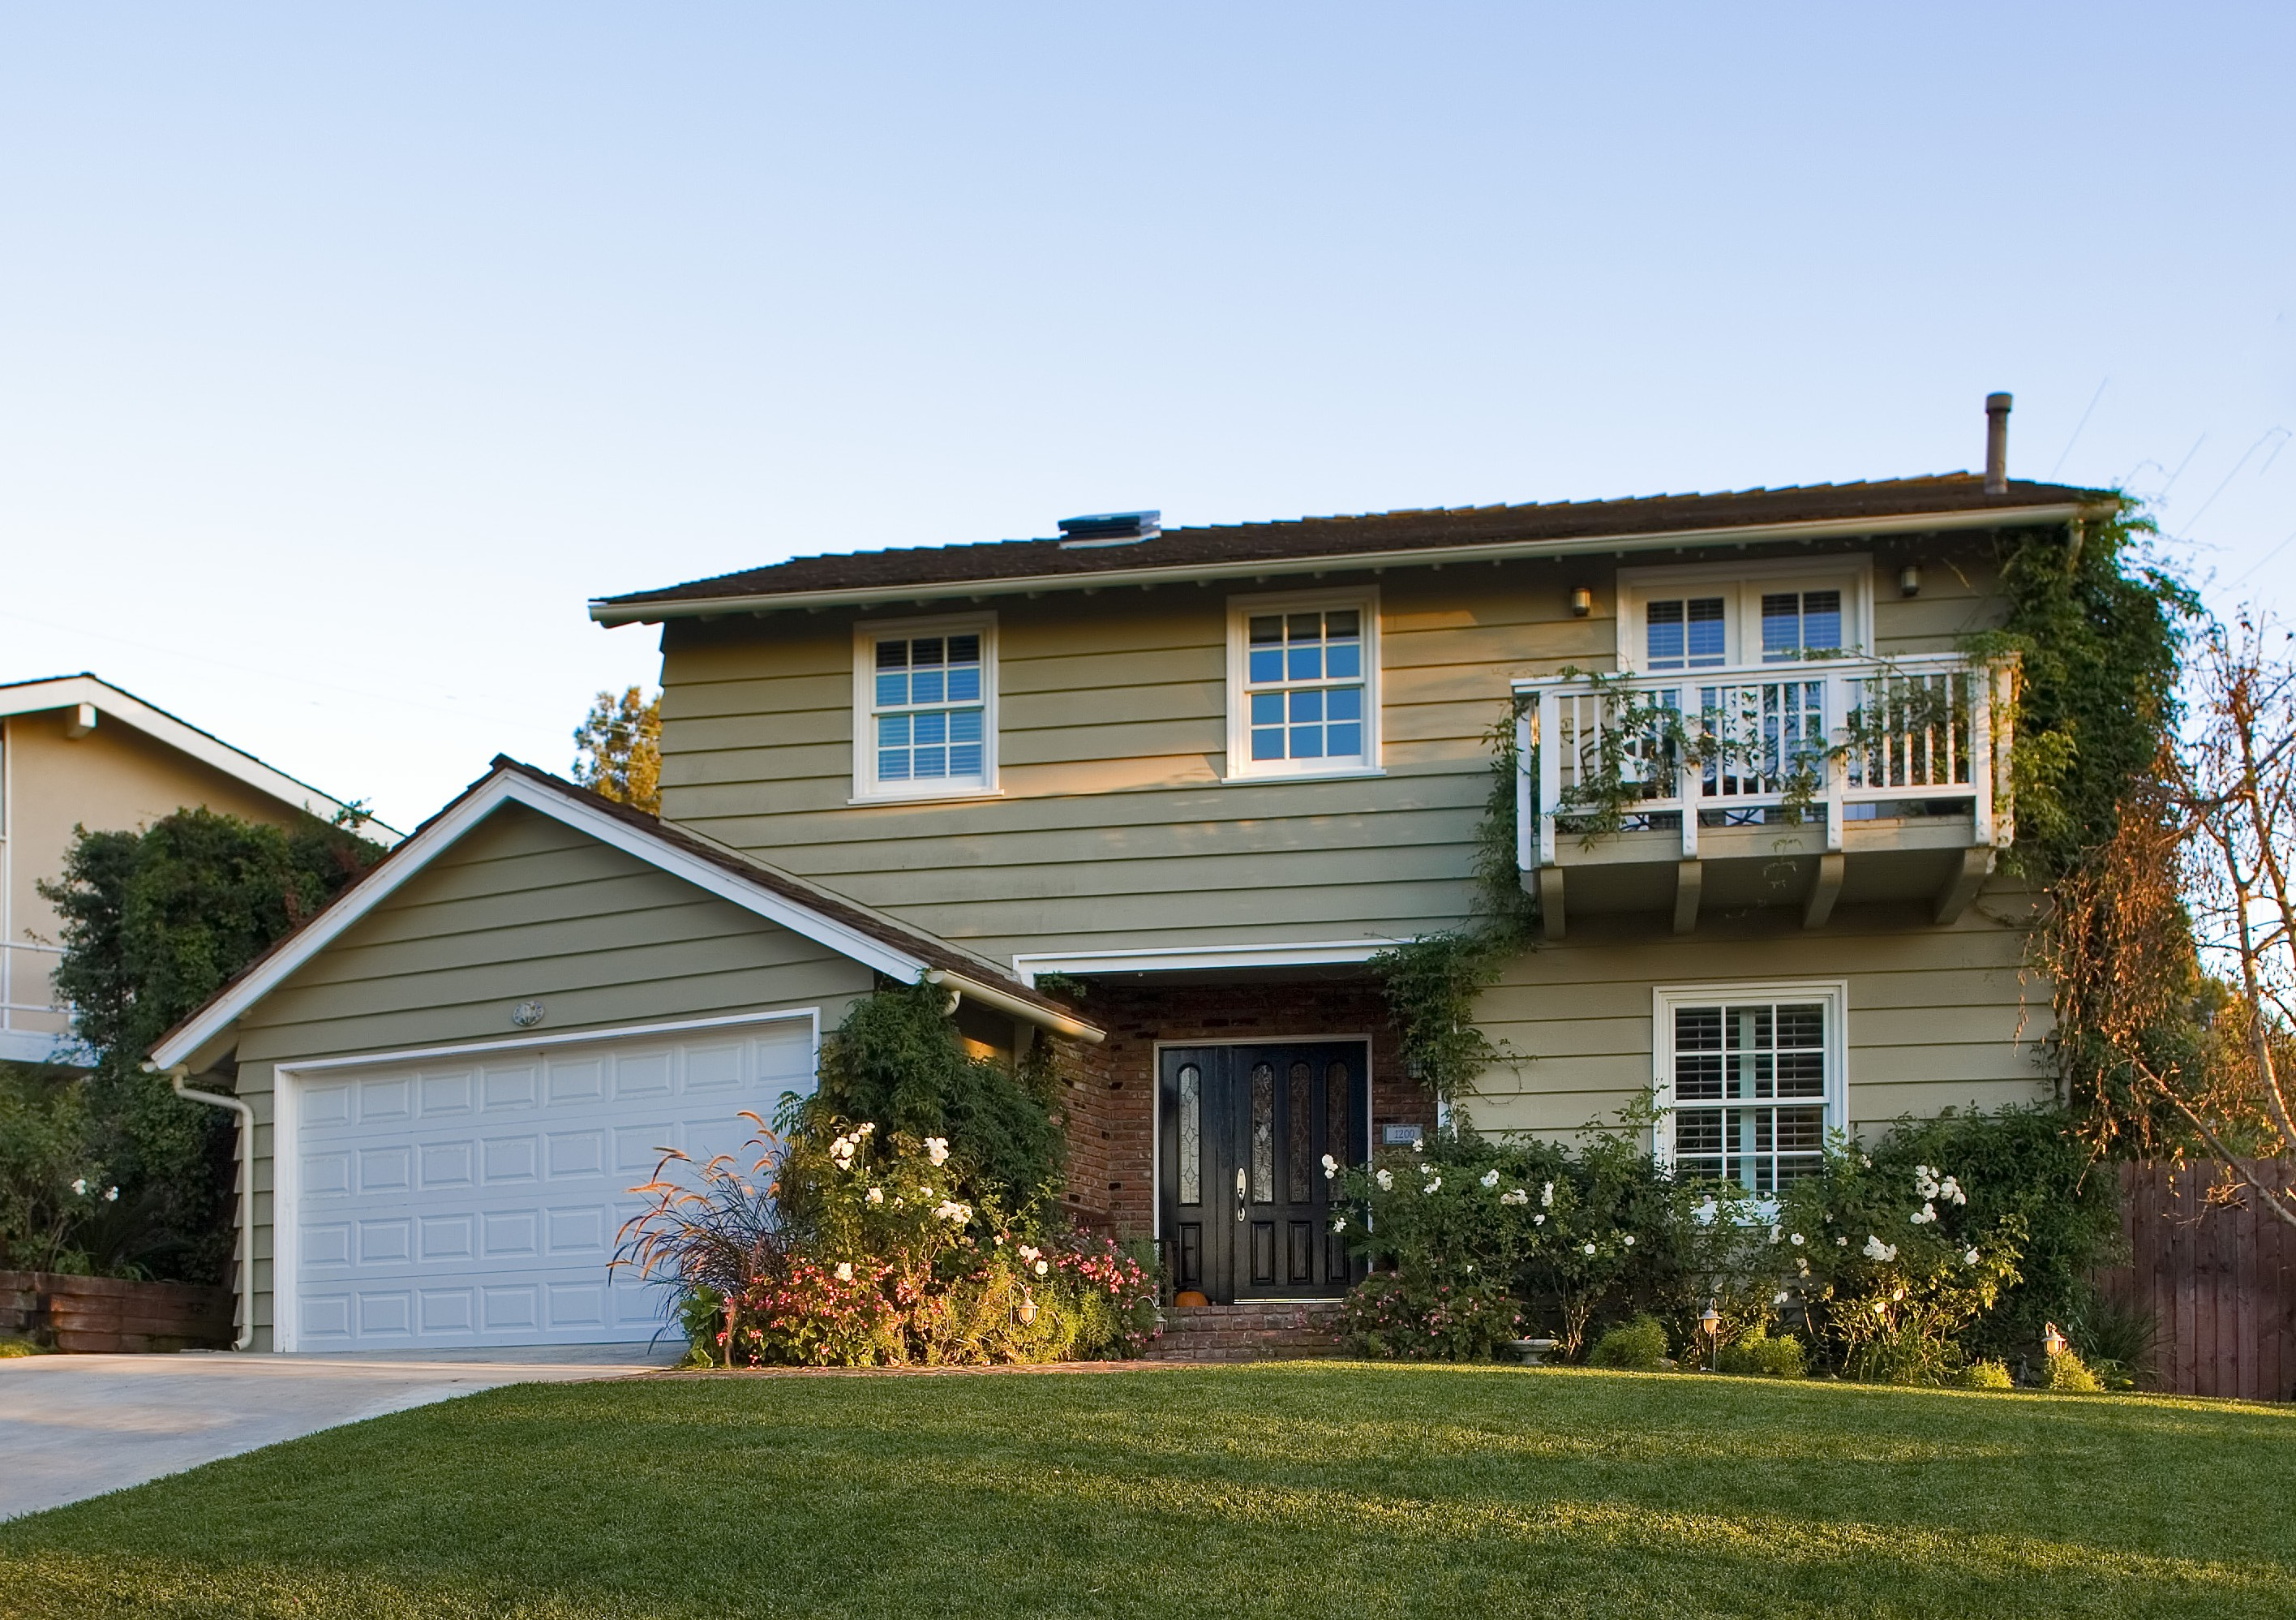 Villa per Vendita alle ore 1200 Via Landeta Palos Verdes Estates, California, 90274 Stati Uniti